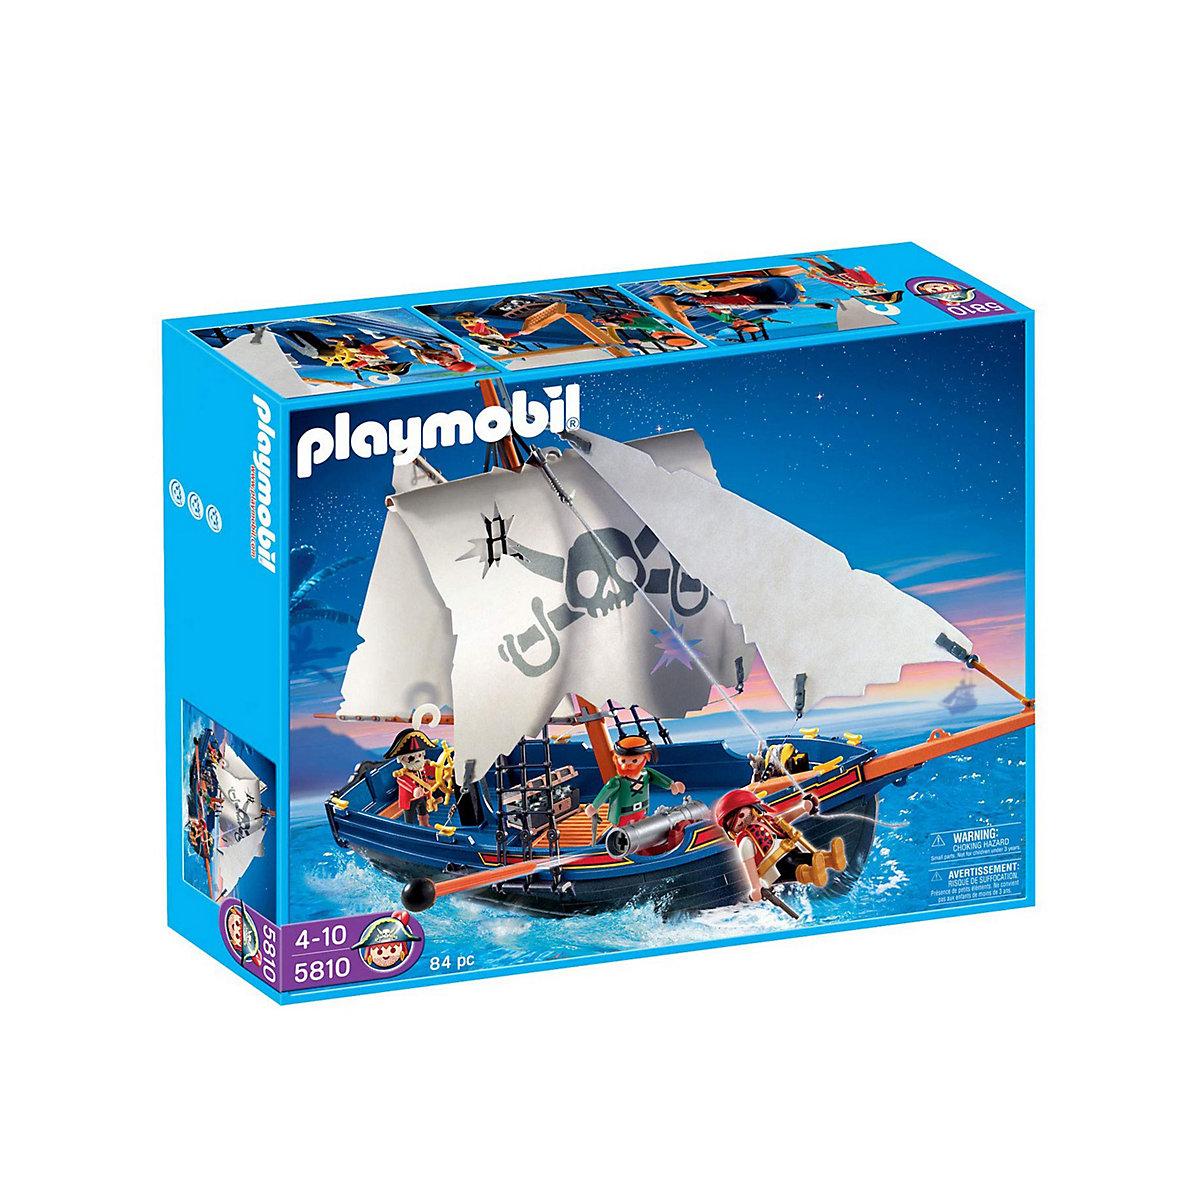 Playmobil 5810 Pirate Ship